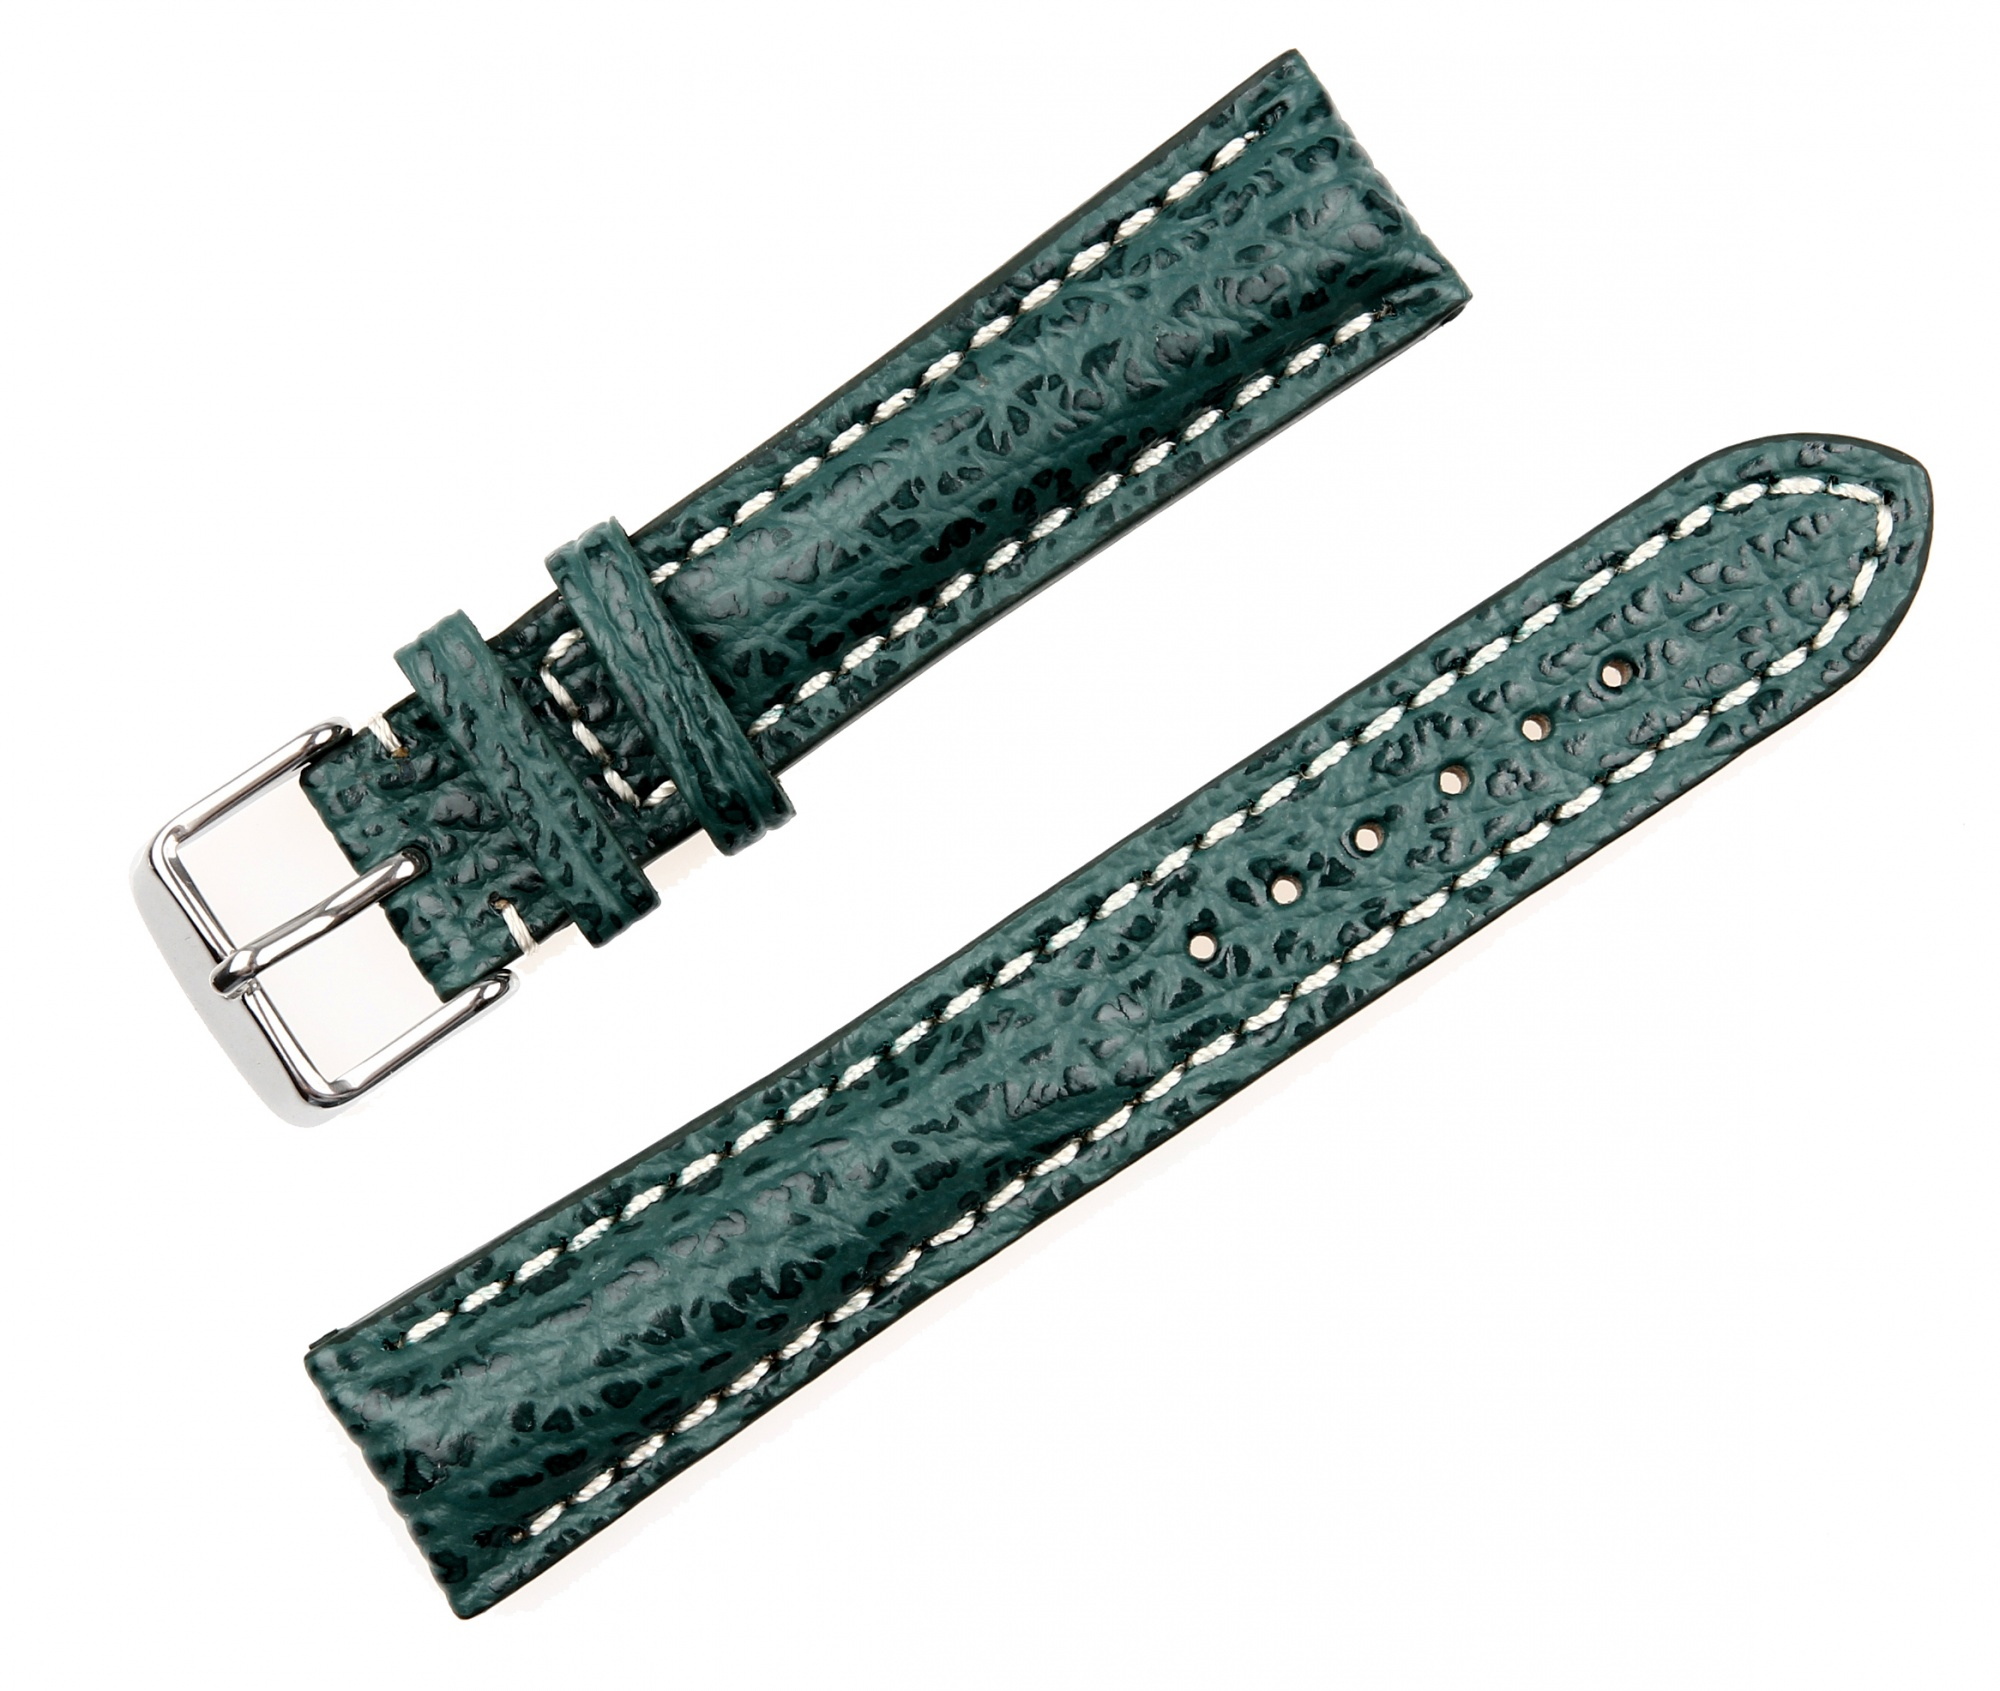 Pasek do zegarka Rekin biała nić - zielony